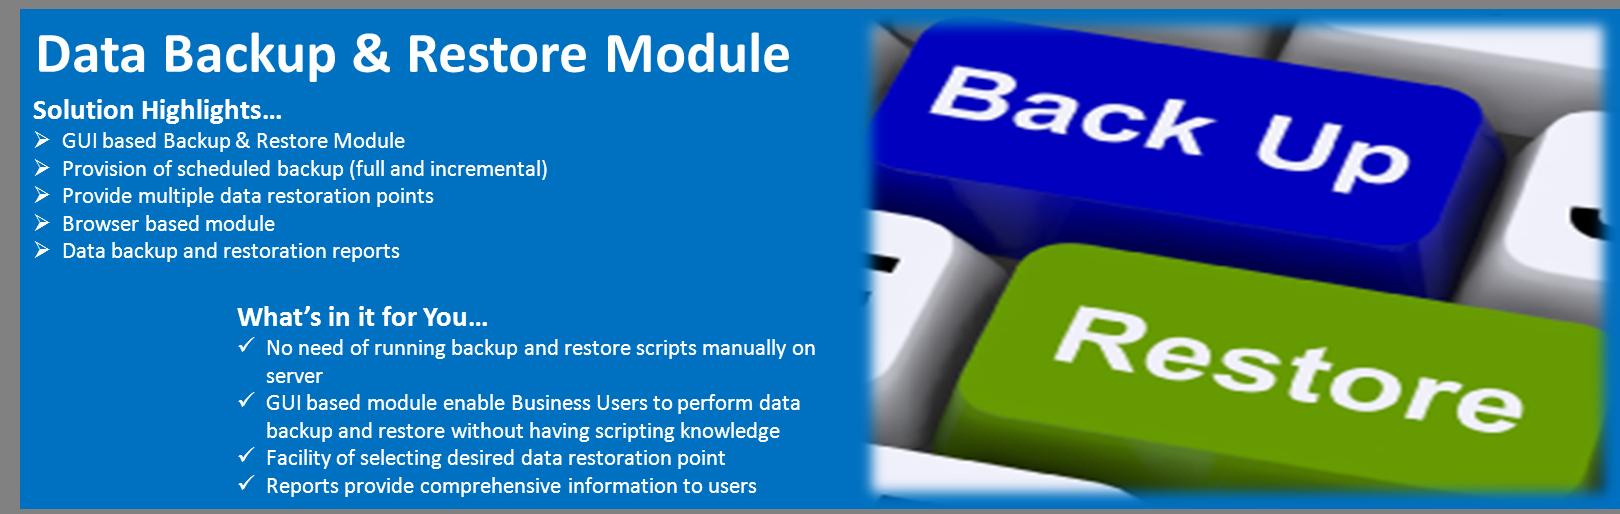 Dspace Data Backup & Restore